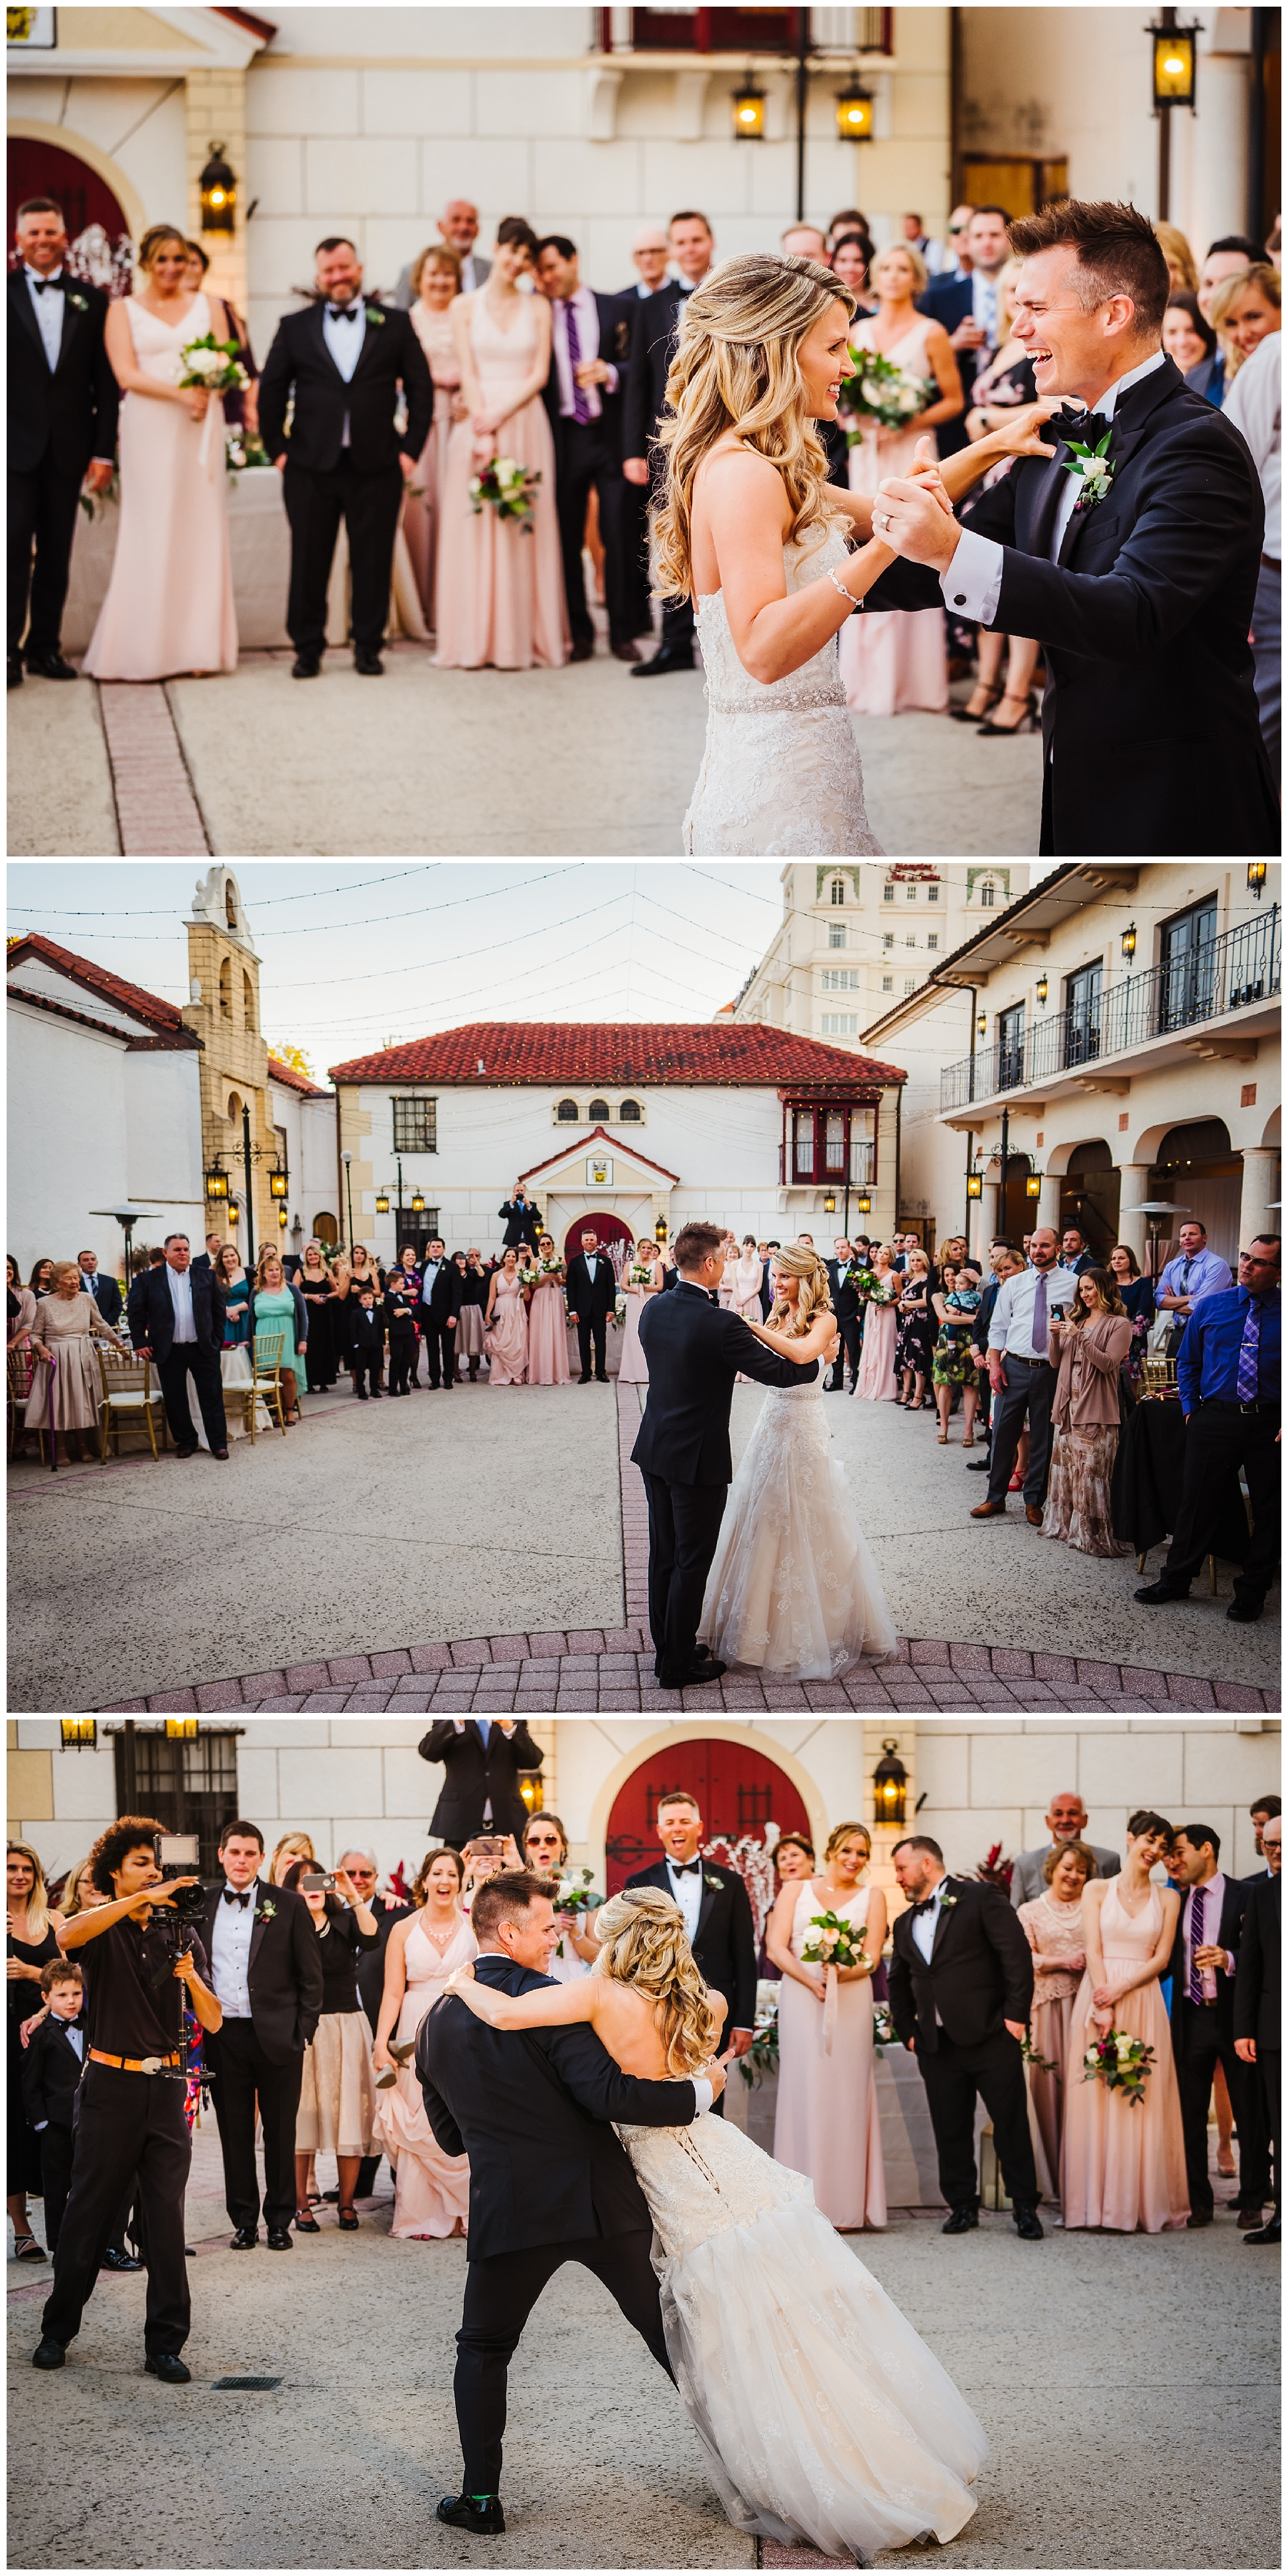 tampa-bradenton-wedding-photographer-south-florida-museum-classic-blush-gold-alpacas-sparklers_0071.jpg